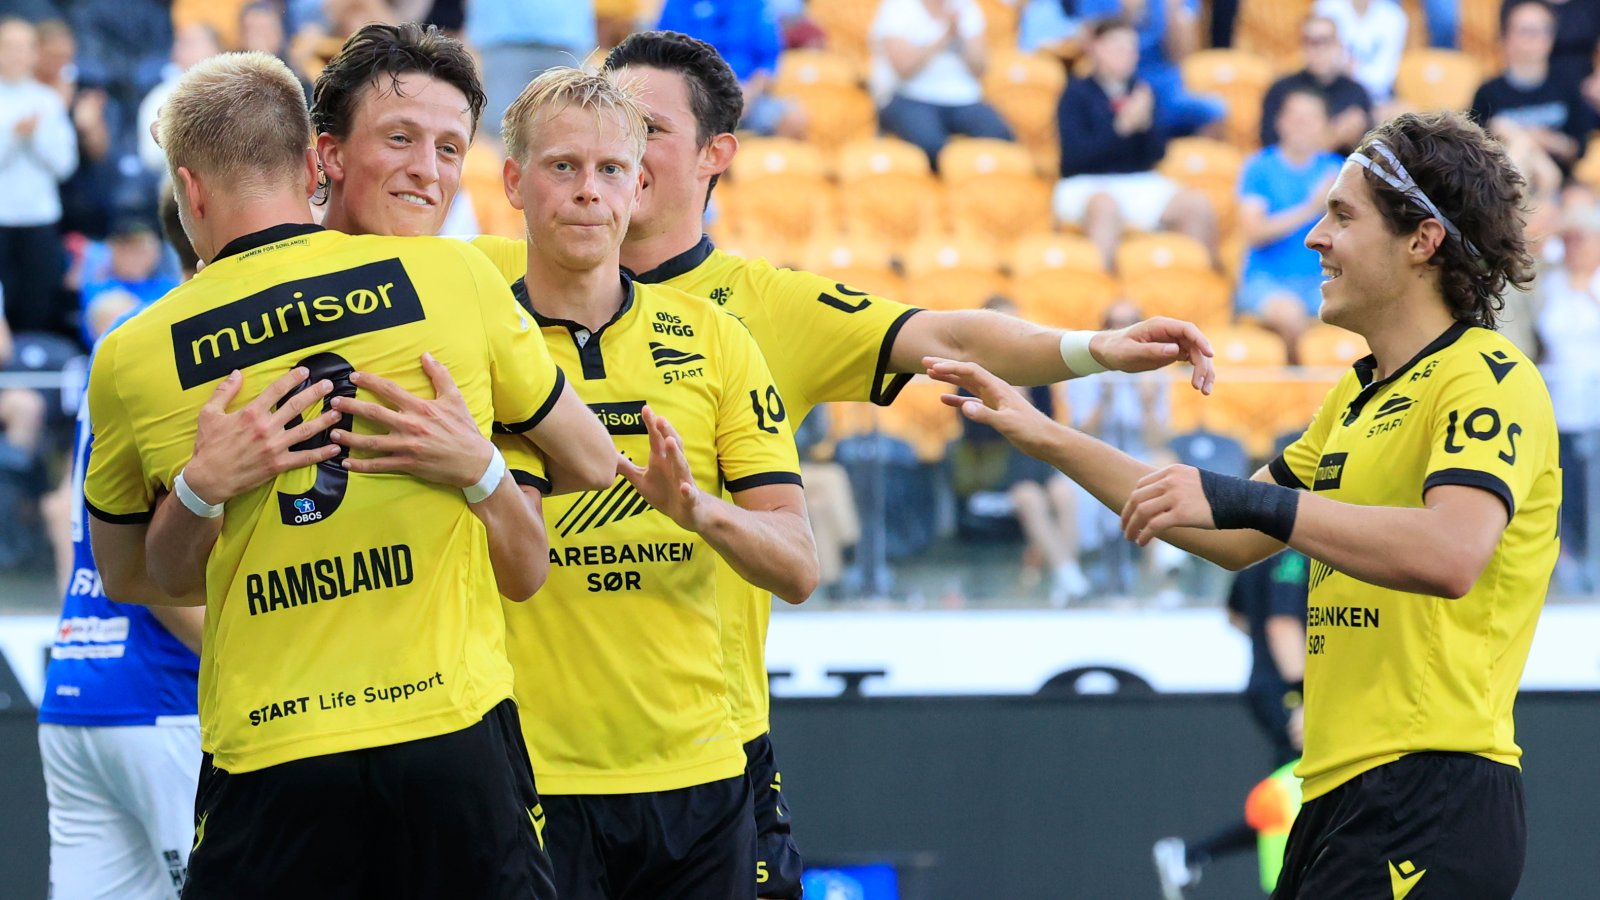 Martin Ramsland, Sander Sjøkvist, Eirik Schulze, Eman Markovic feirer scoring mot Stjørdals-Blink. Foto: Tor Erik Schrøder / NTB